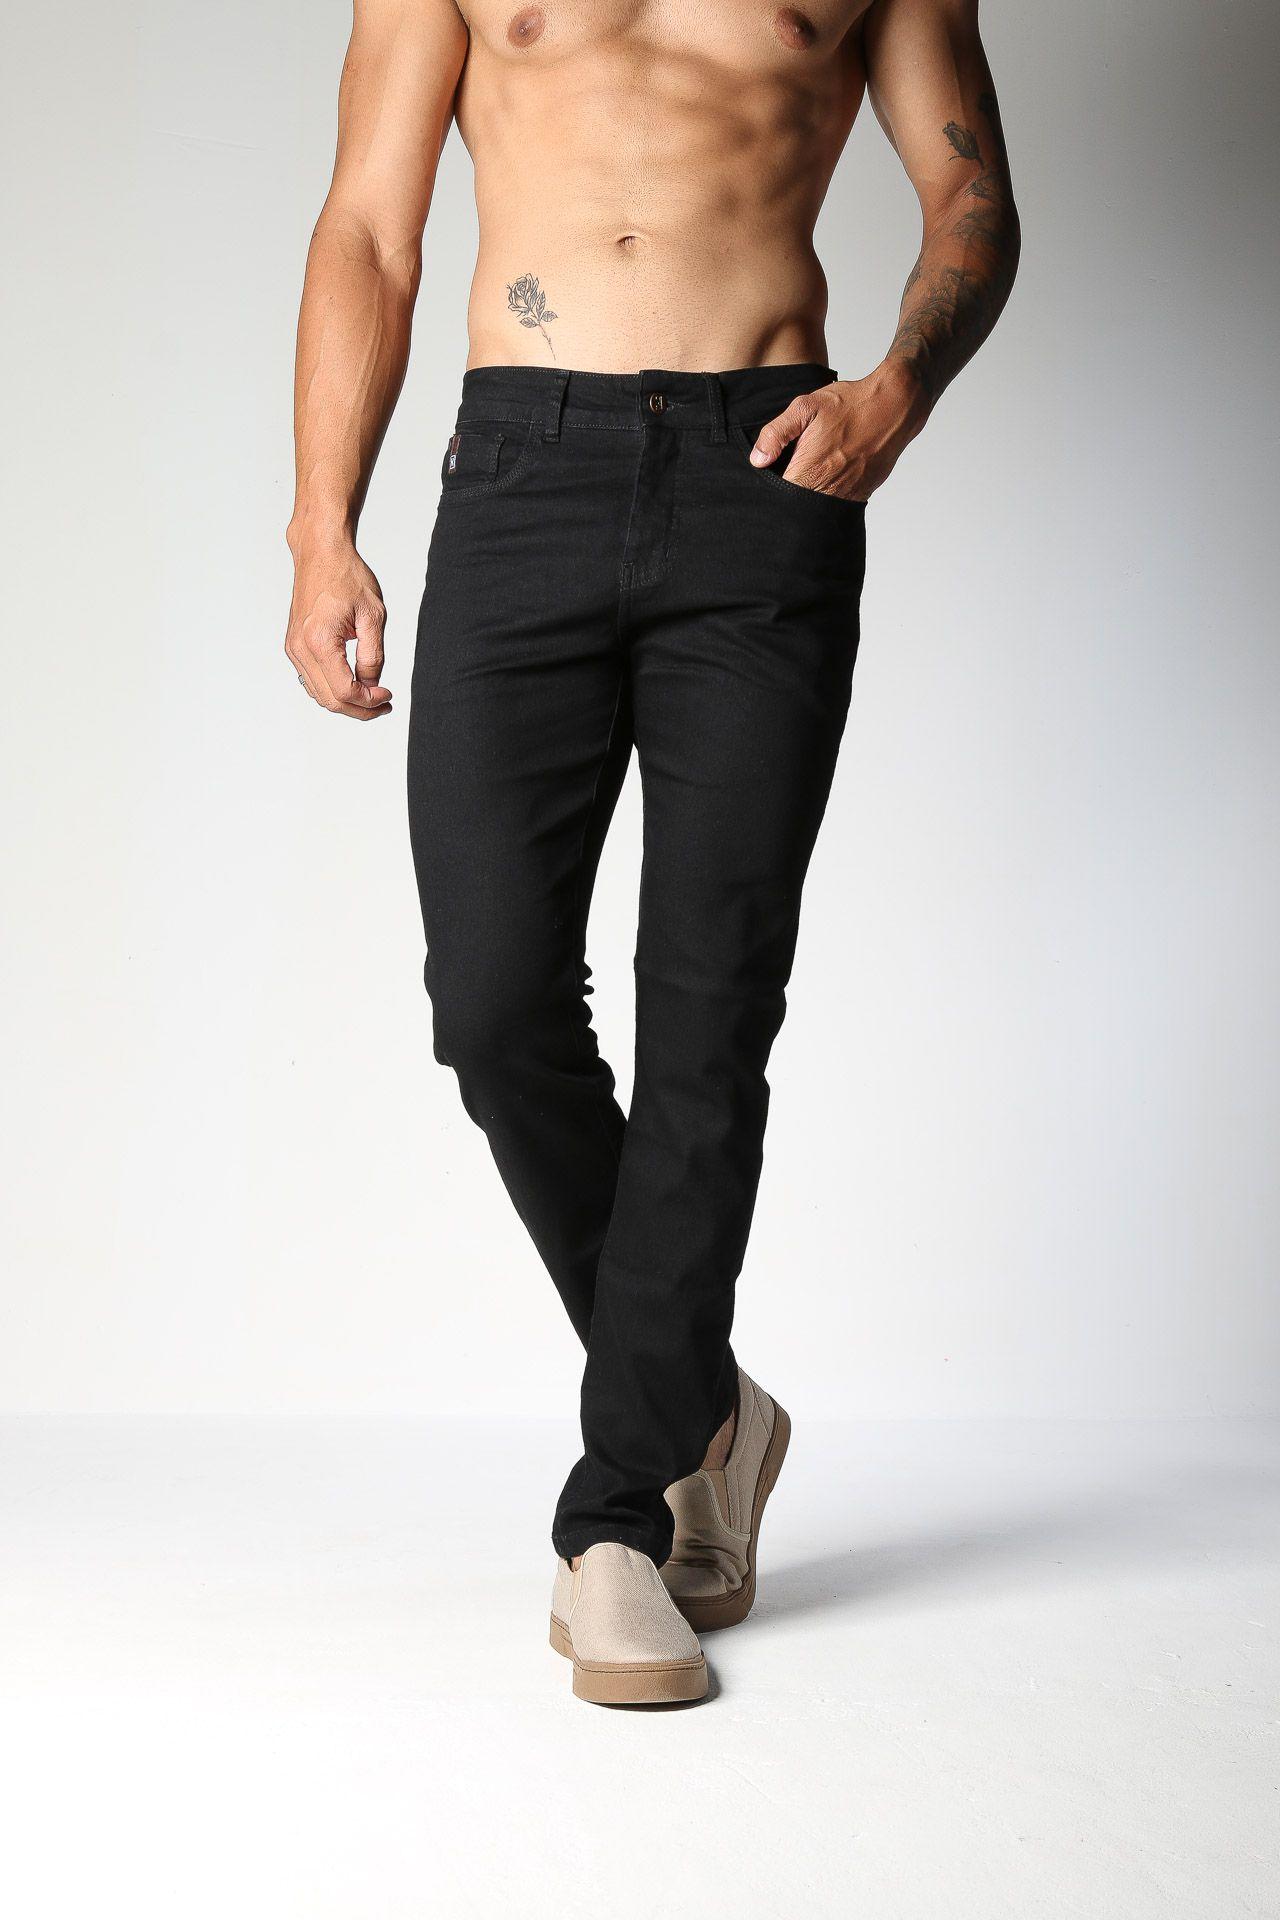 Calça Jeans TXC Masculina REGULAR PRETO 3% ELASTANO